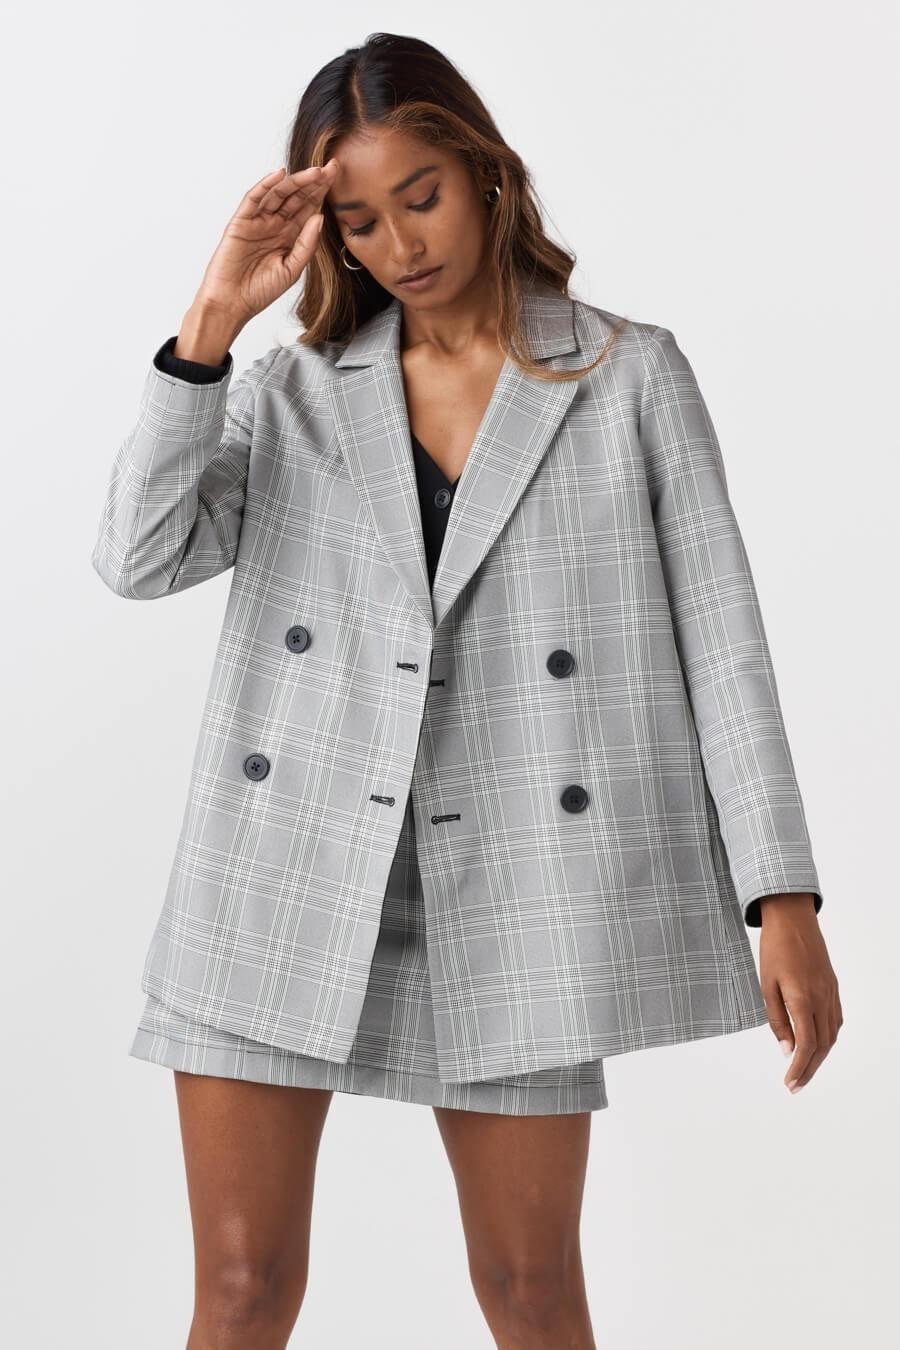 model wearing the gray oversized plaid blazer